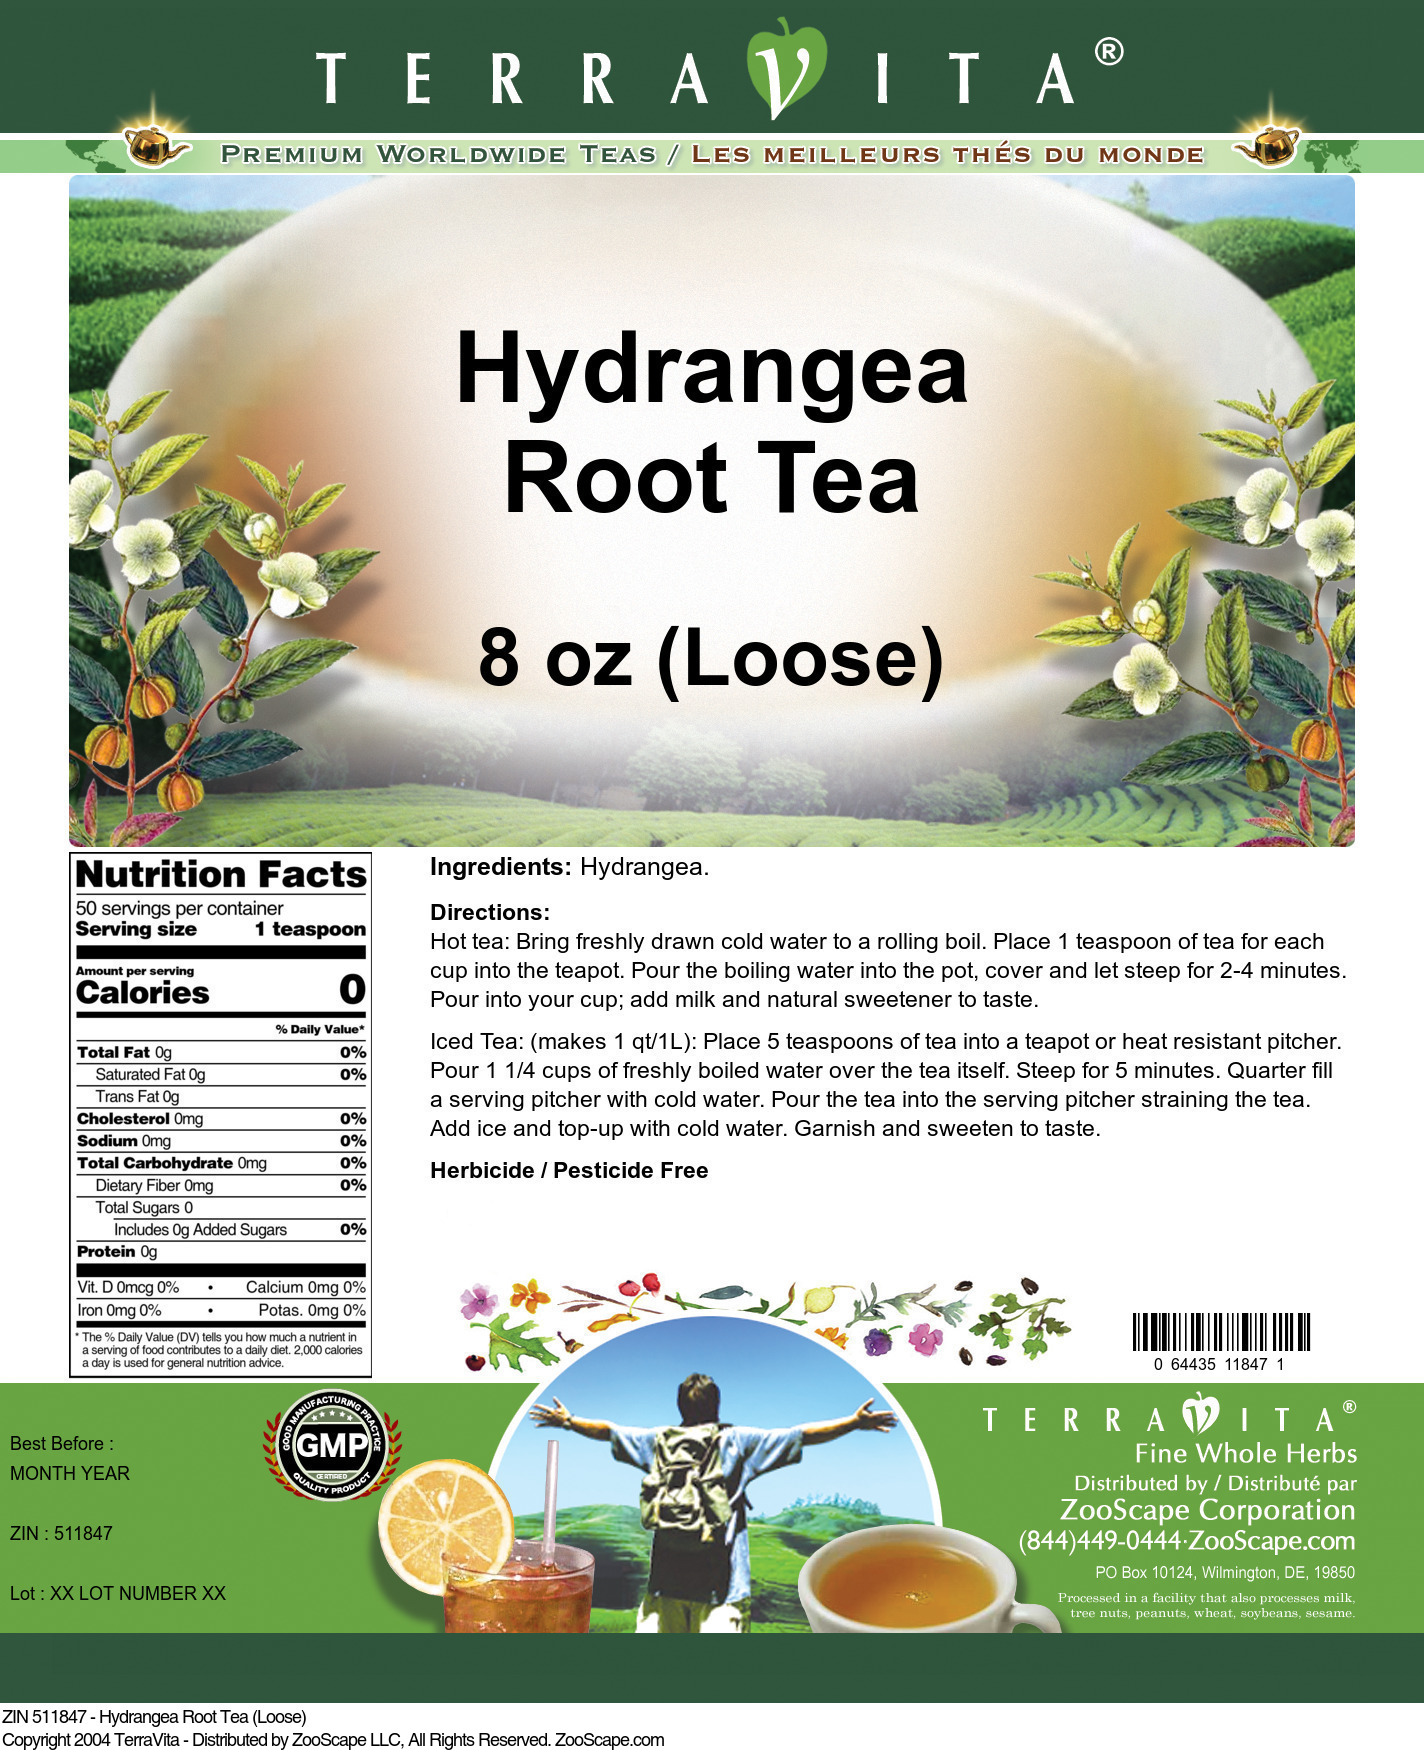 Hydrangea Root